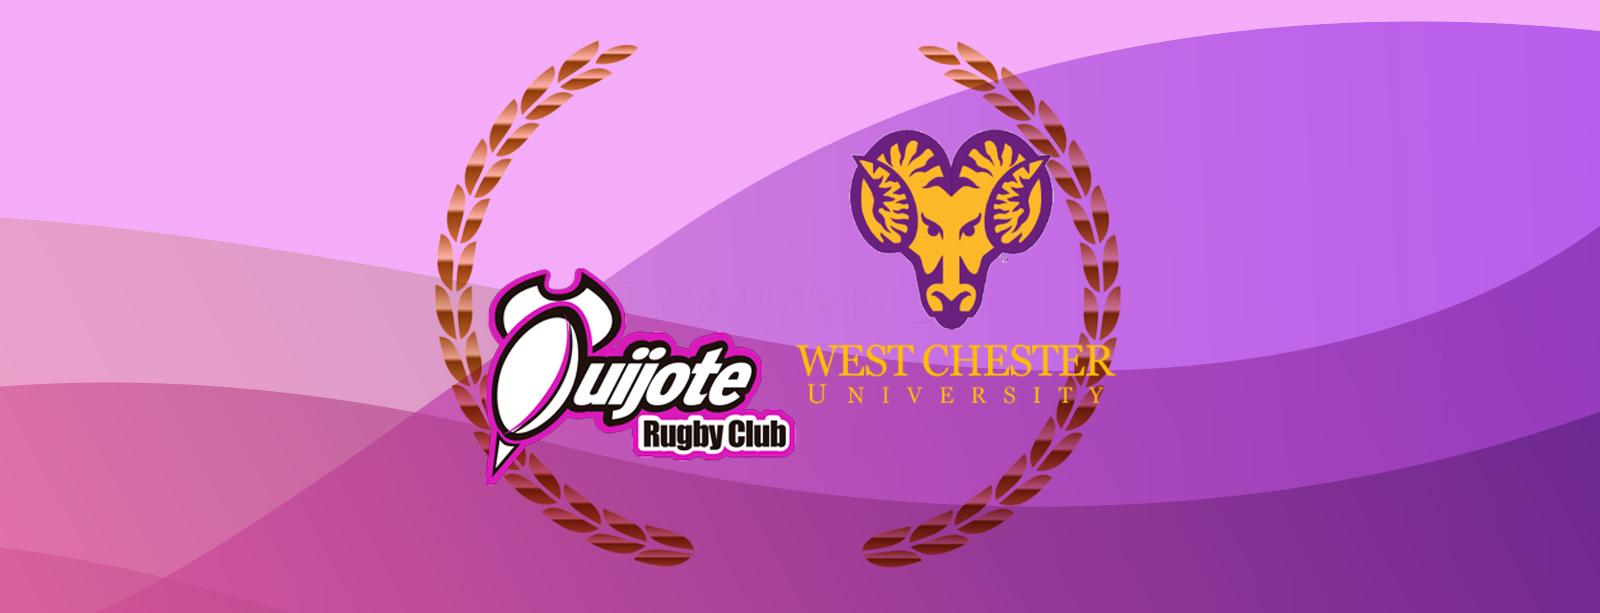 El Quijote Rugby Club recibe al West Chester University